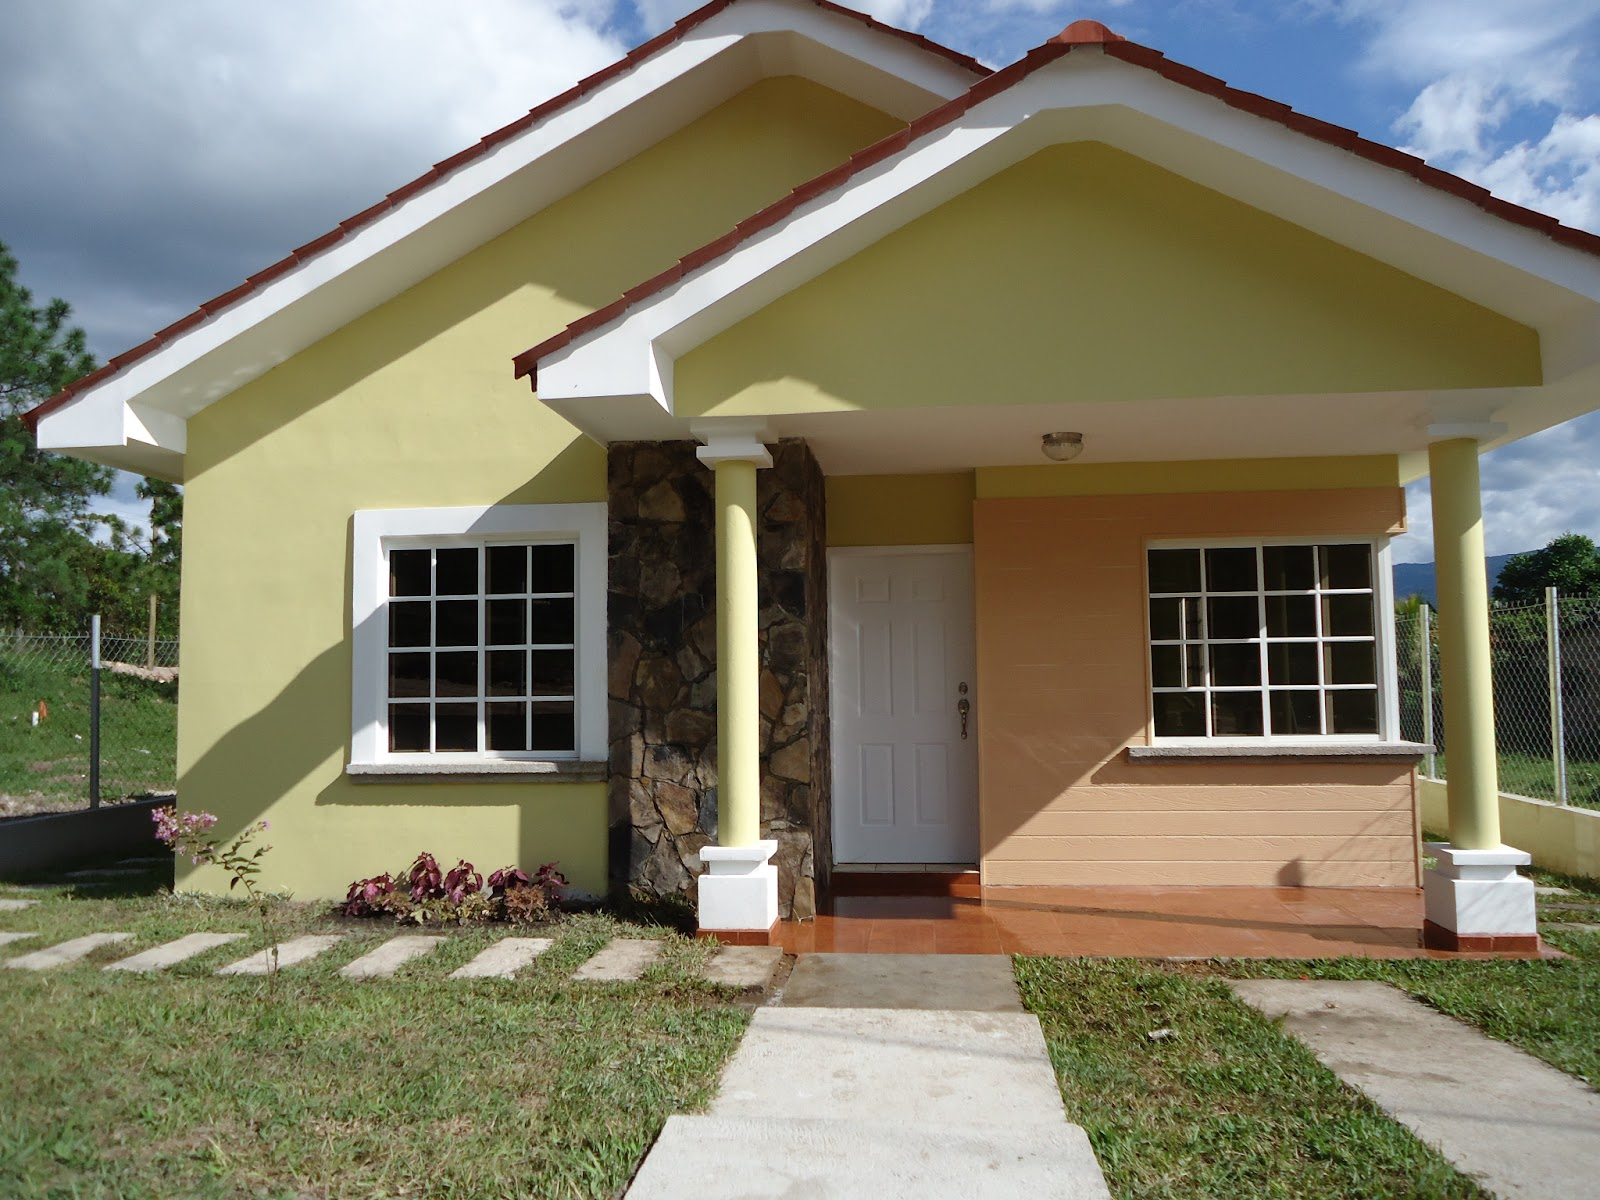 Casas de madera prefabricadas casas prefabricadas buenos - Casas de maderas prefabricadas ...